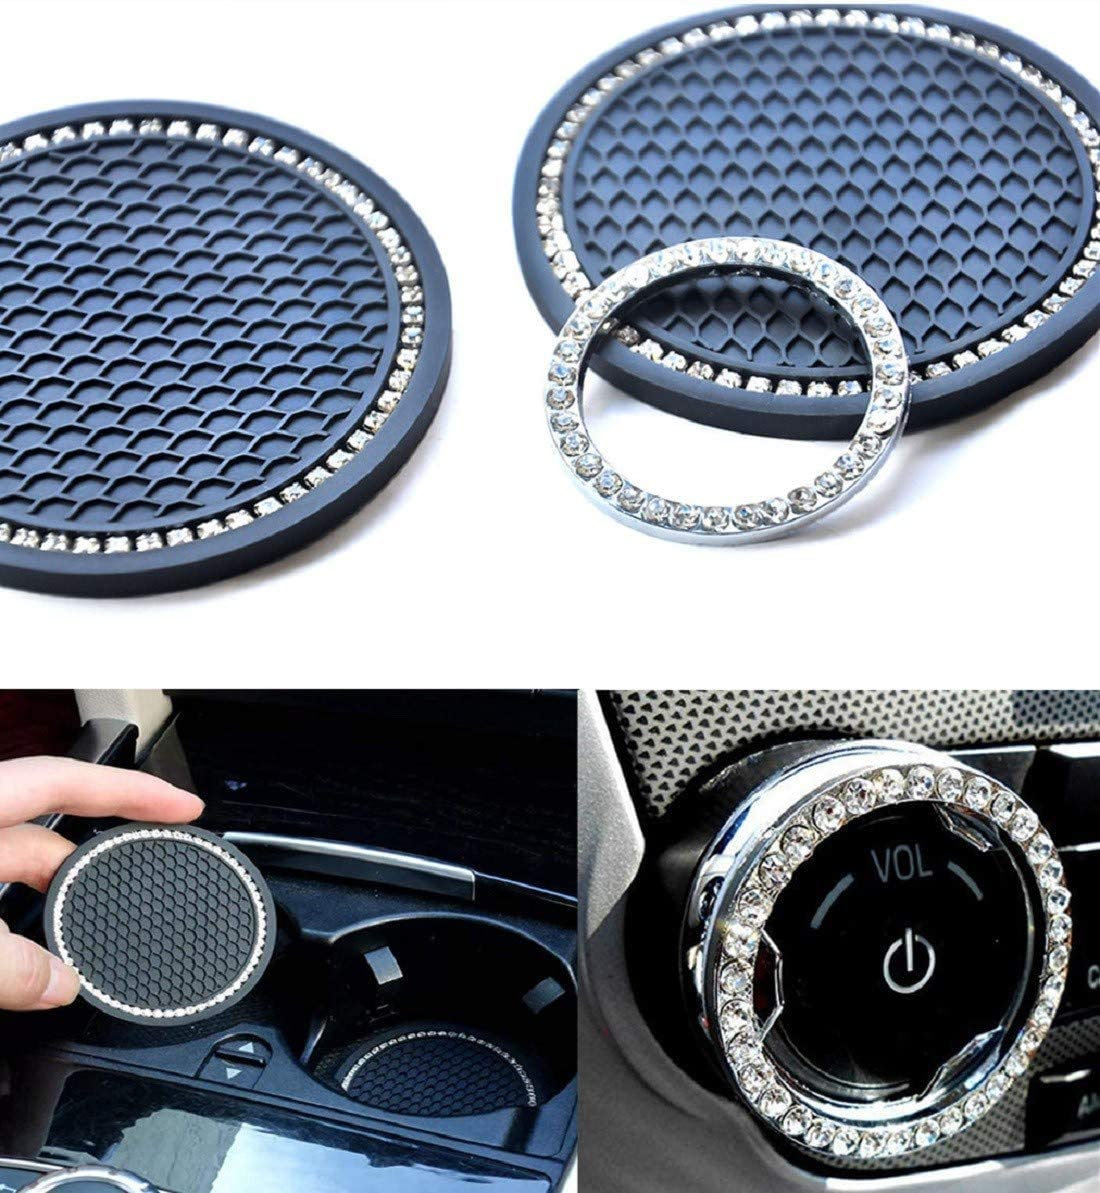 aurrako Car Coaster ,Bling Car Accessories for Women(3Pcs/Set), Universal 2.75 inch Silicone Anti Slip Crystal Rhinestone Car Cup Holder Coasters (Classic Style)